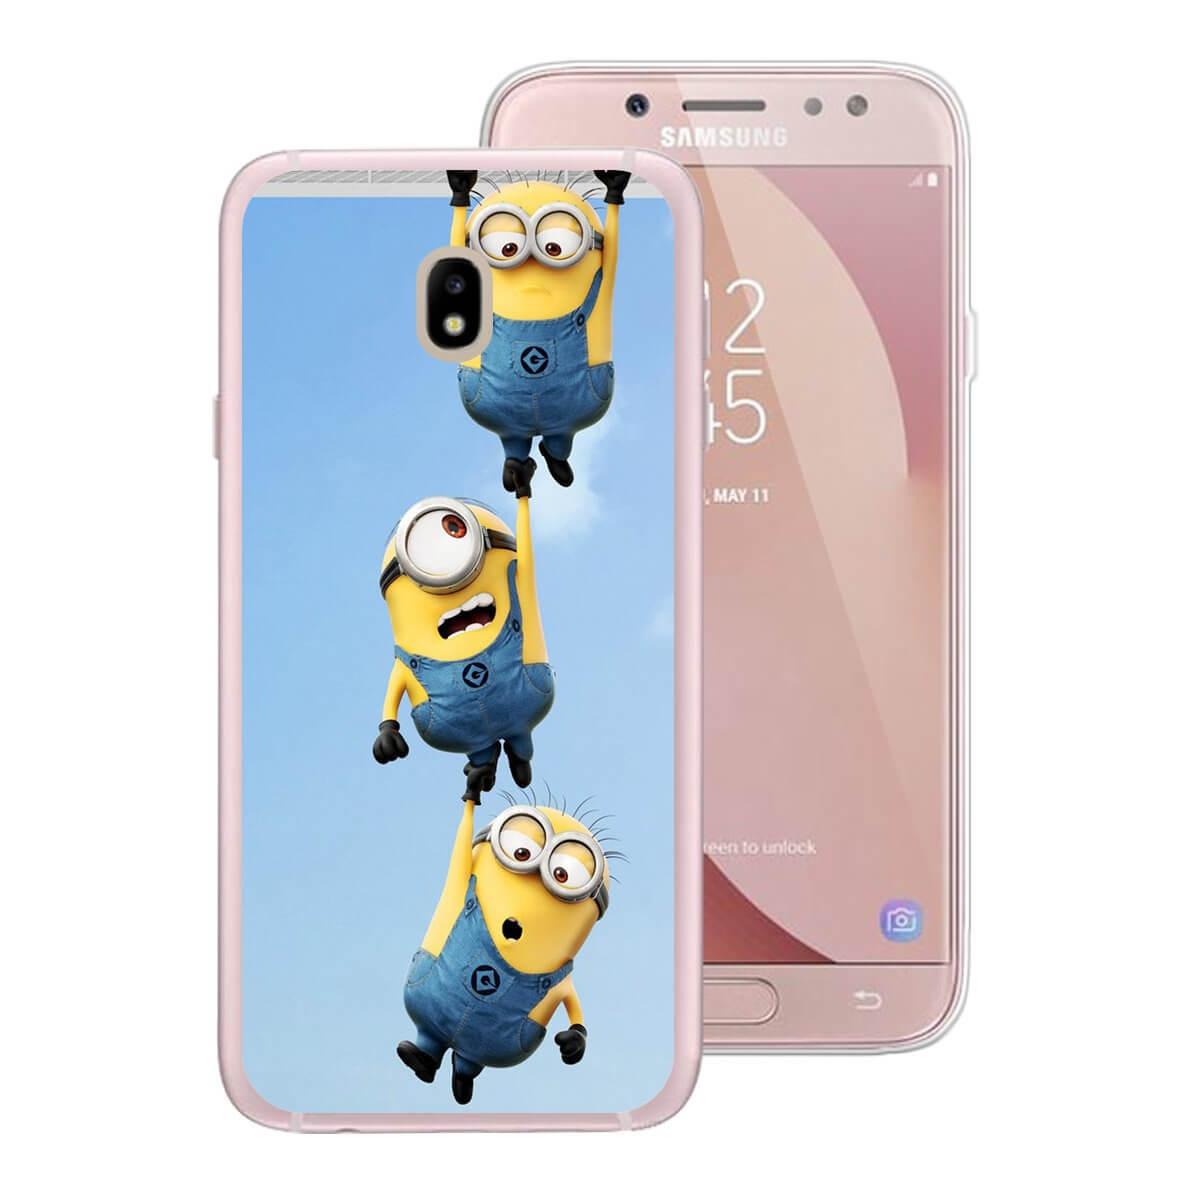 FORCELL MY ART kryt Samsung Galaxy J5 2017 (J530) MIMONI (021)